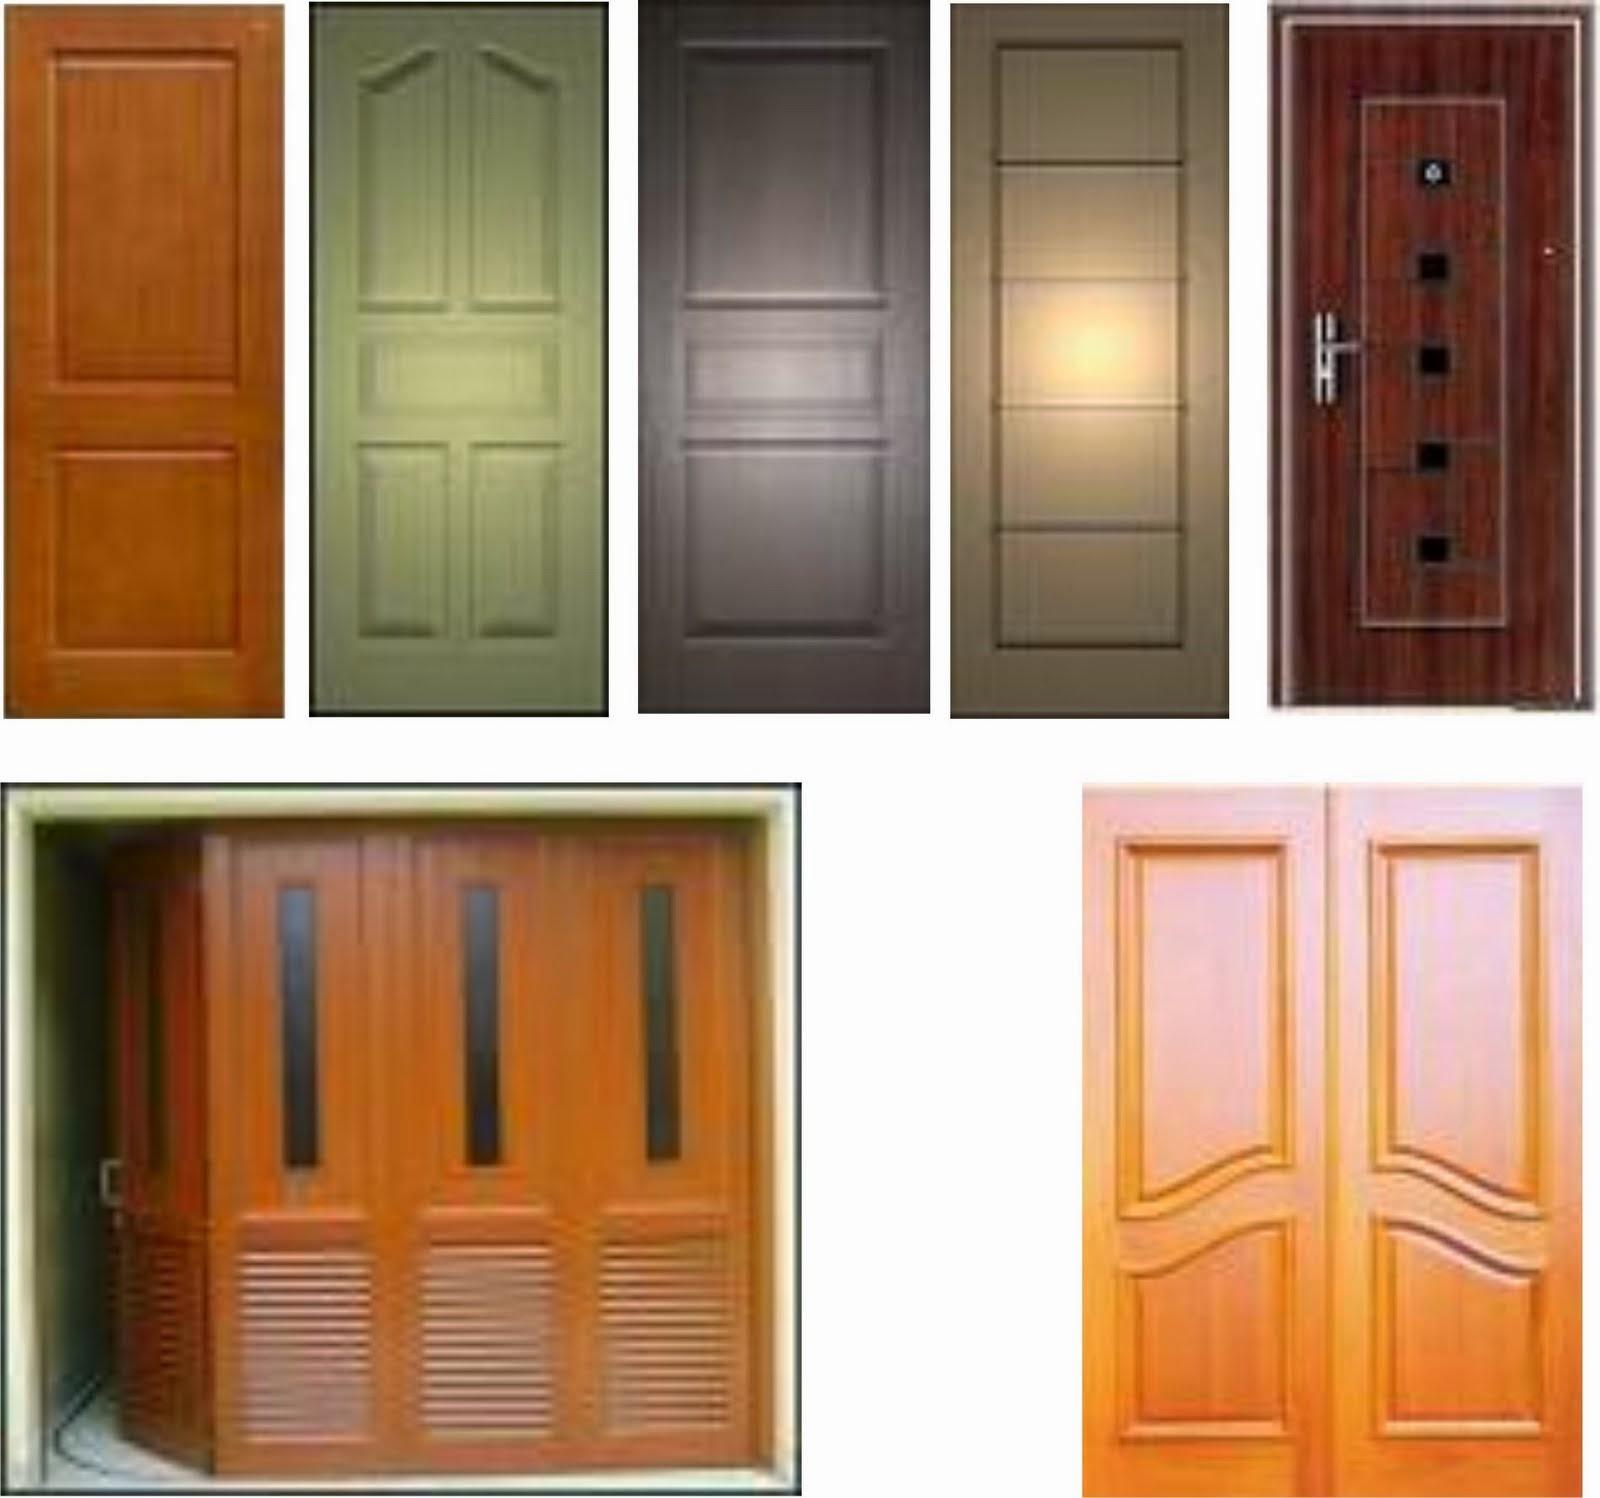 Model Pintu Rumah Minimalis Modern Terbaru Yang Cantik